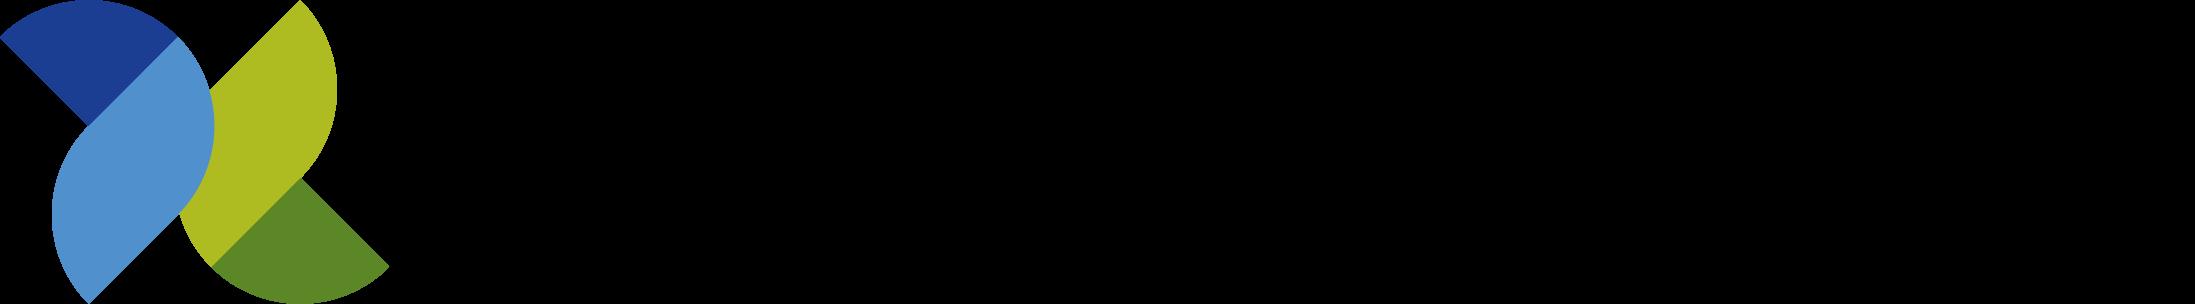 Hexion logo